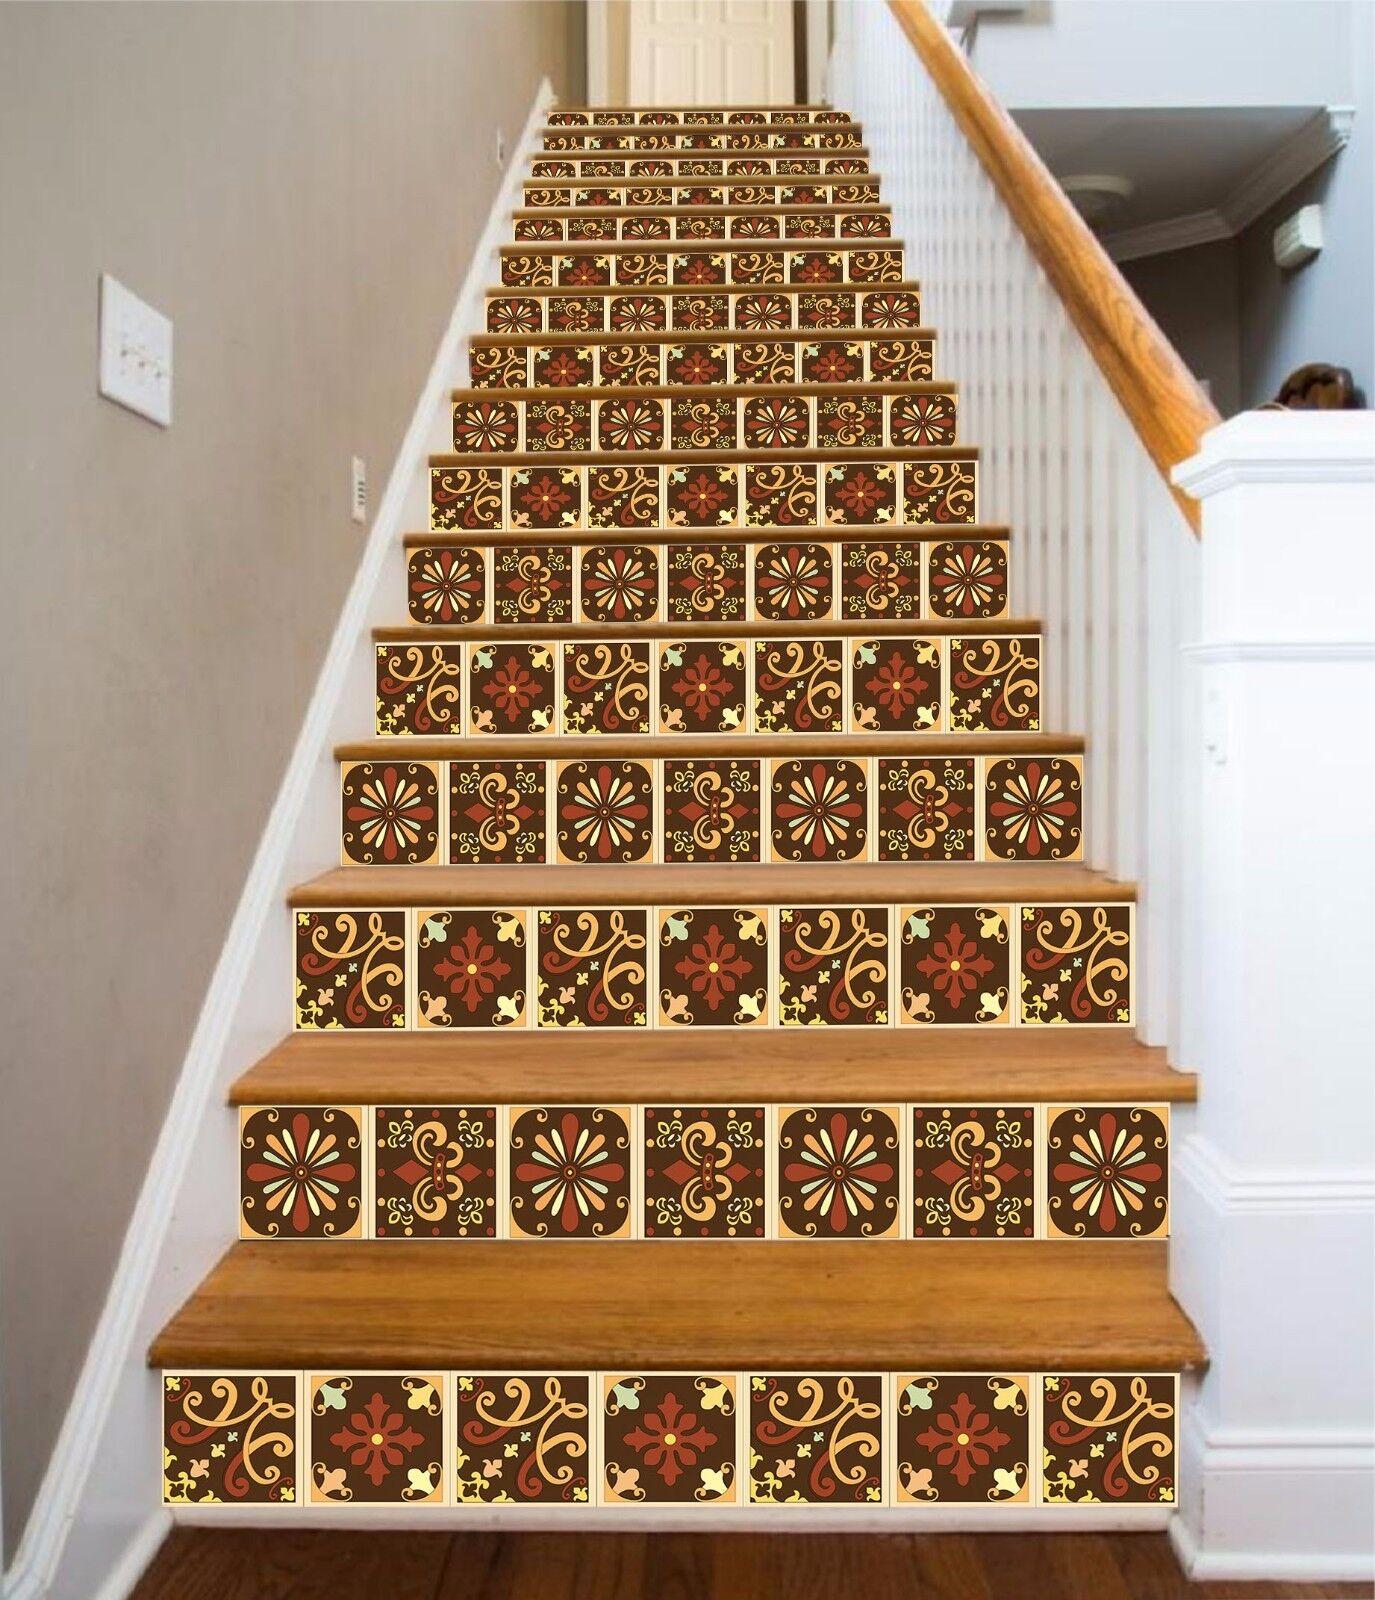 3D Metall Muster 30 Stair Risers Dekoration Fototapete Vinyl Aufkleber Tapete DE